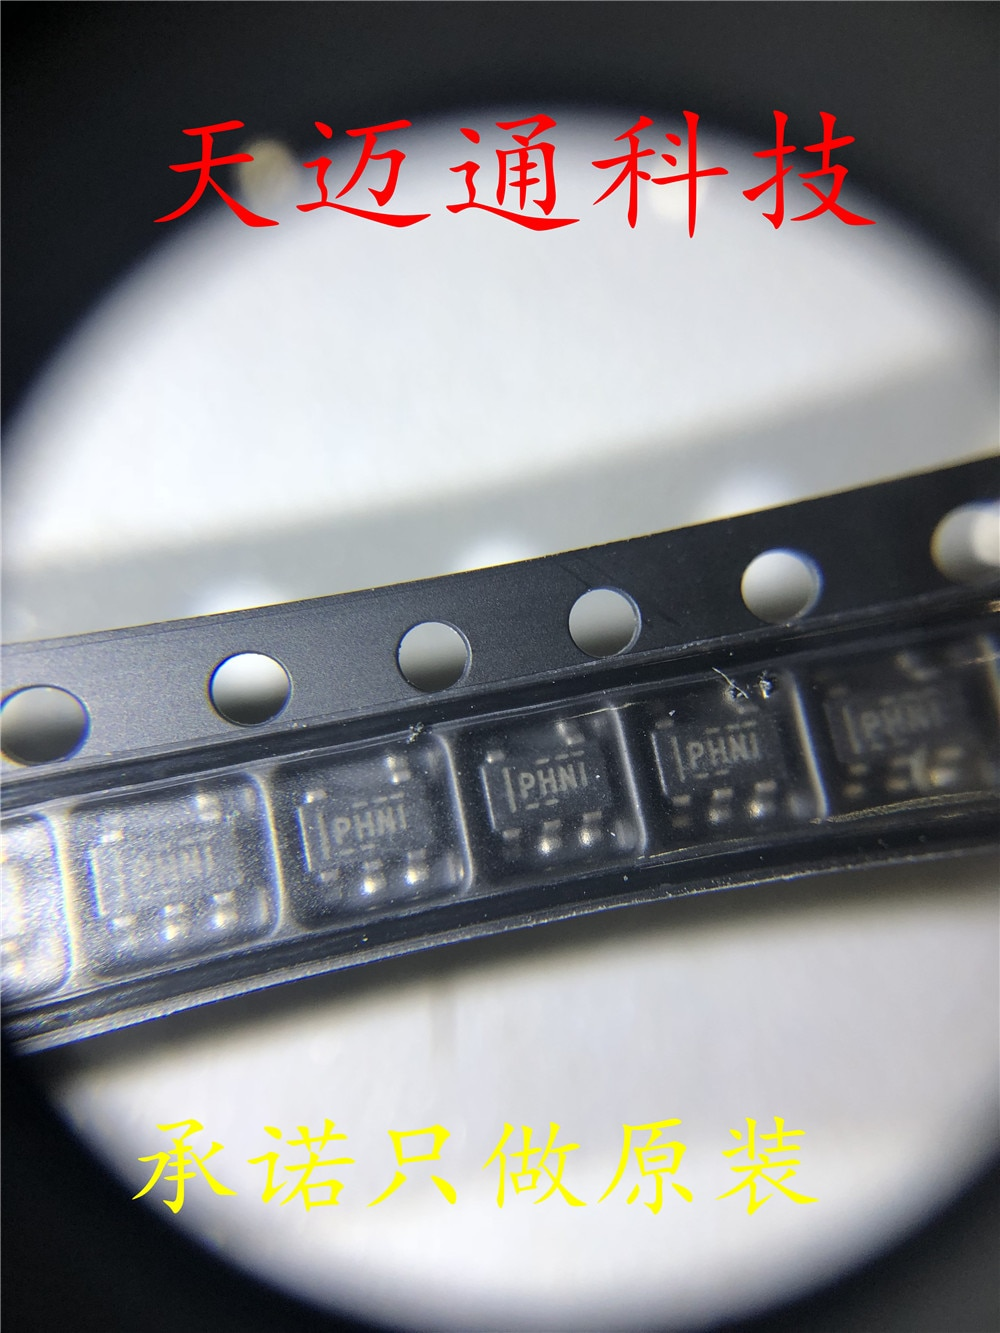 Frete grátis tps62203dbvr phni SOT23-5 tibom 10 peças